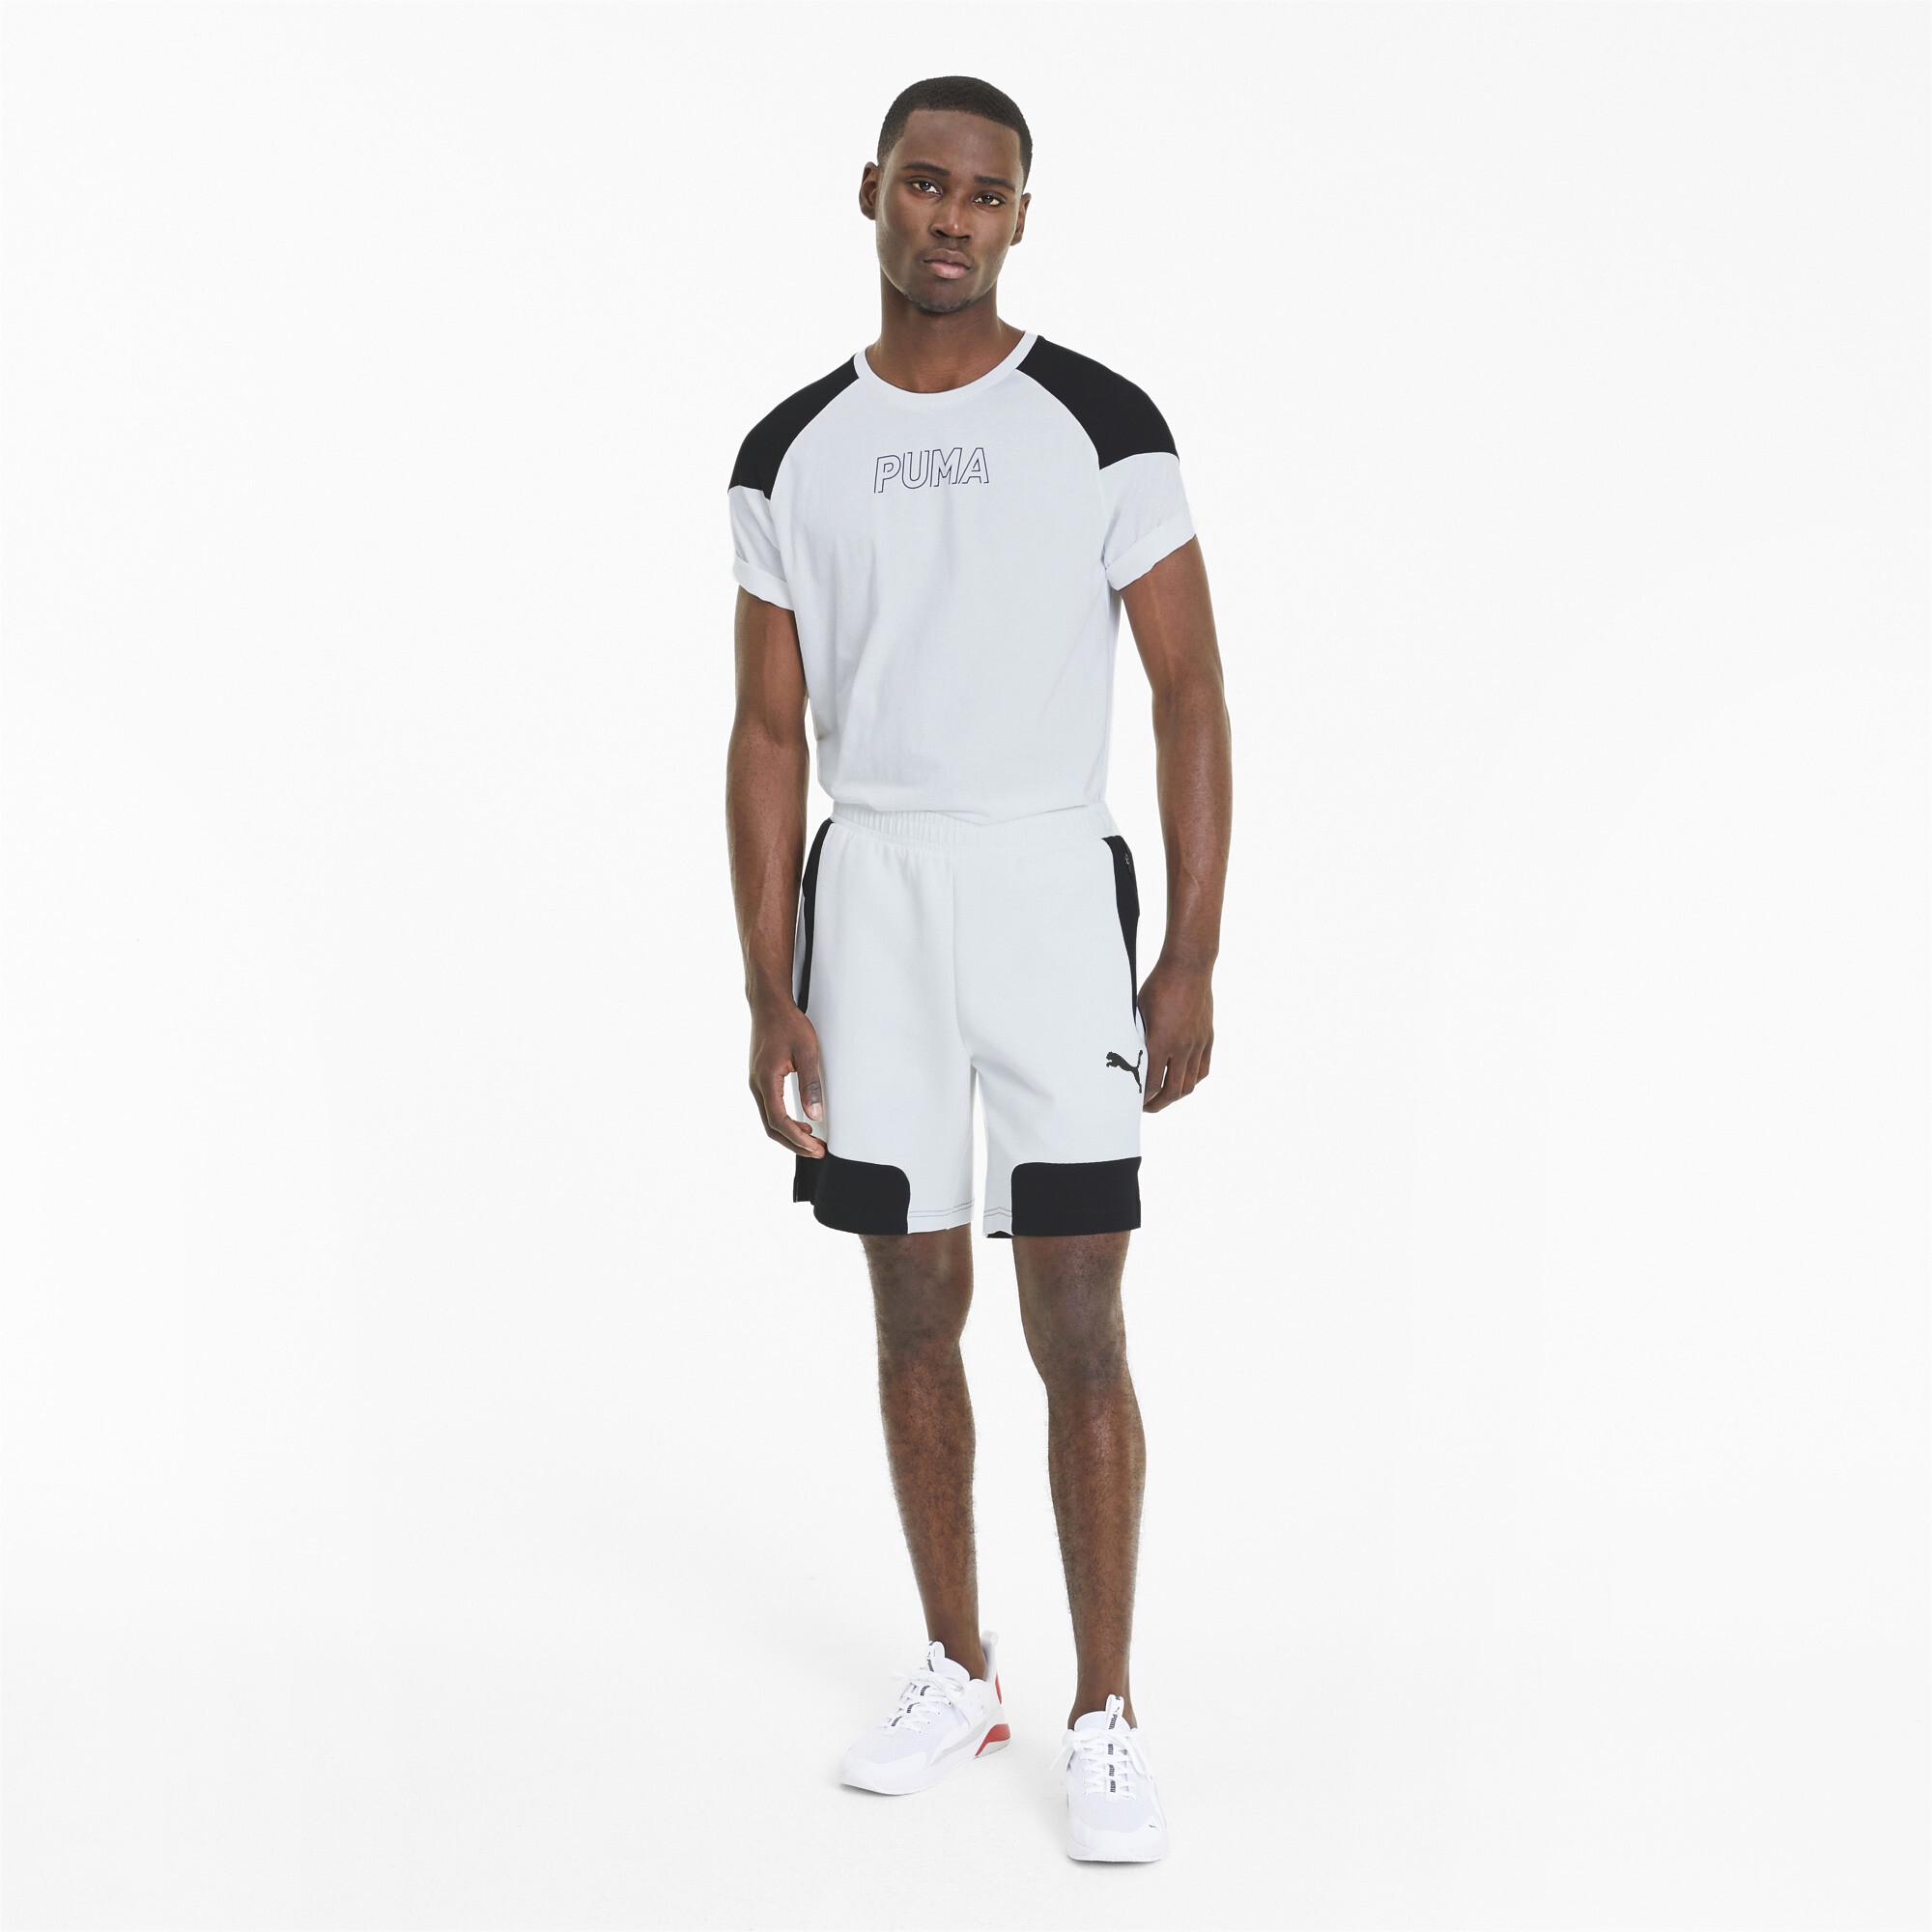 PUMA-Evostripe-Men-039-s-Shorts-Men-Knitted-Shorts-Basics thumbnail 22